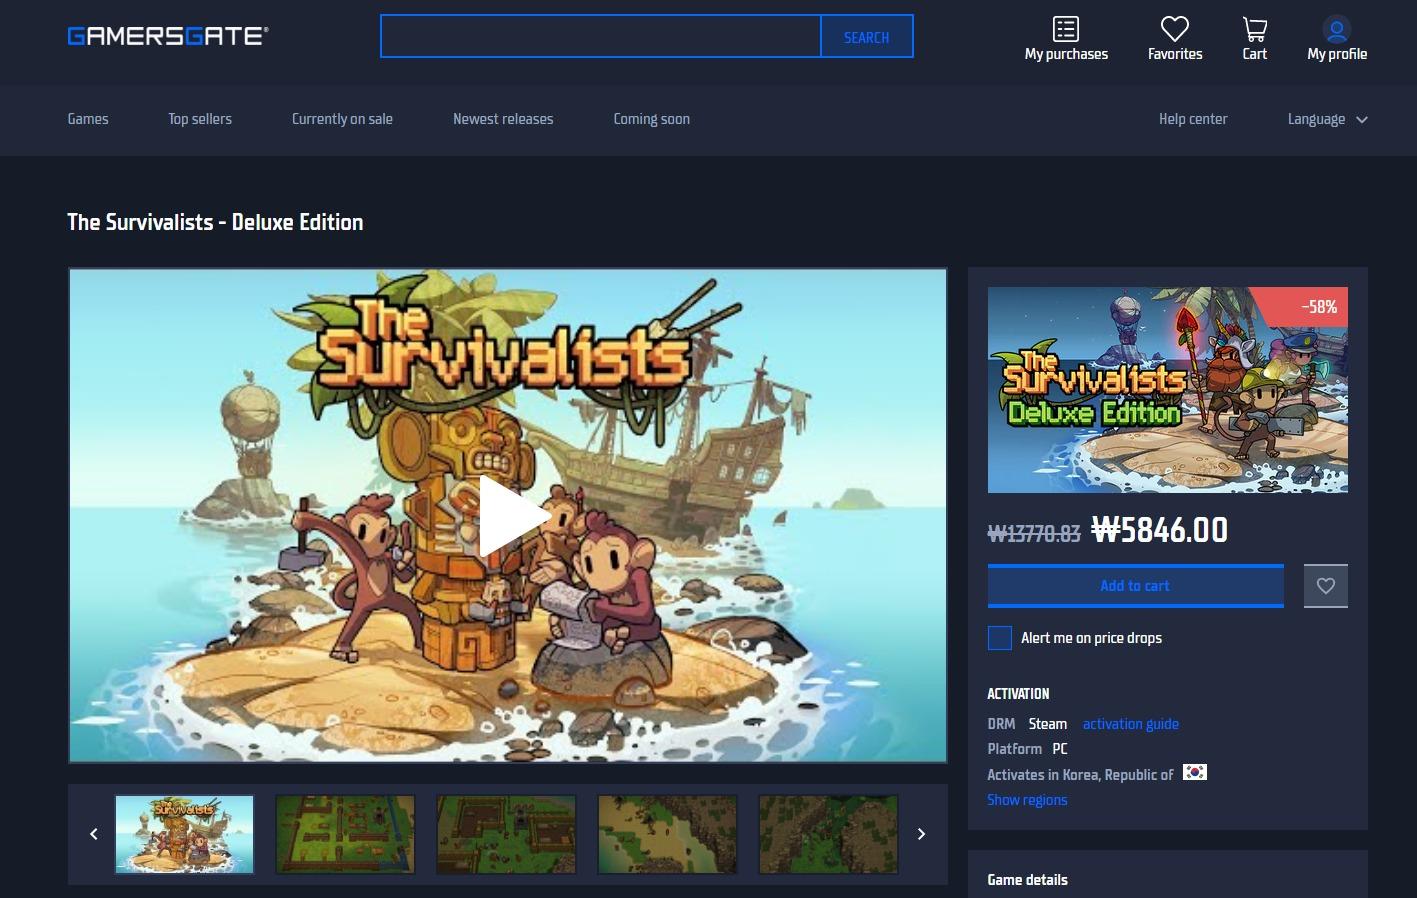 FireShot Capture 782 - The Survivalists - Deluxe Edition - PC Steam Game Key - GamersGate_ - www.gamersgate.com.jpg